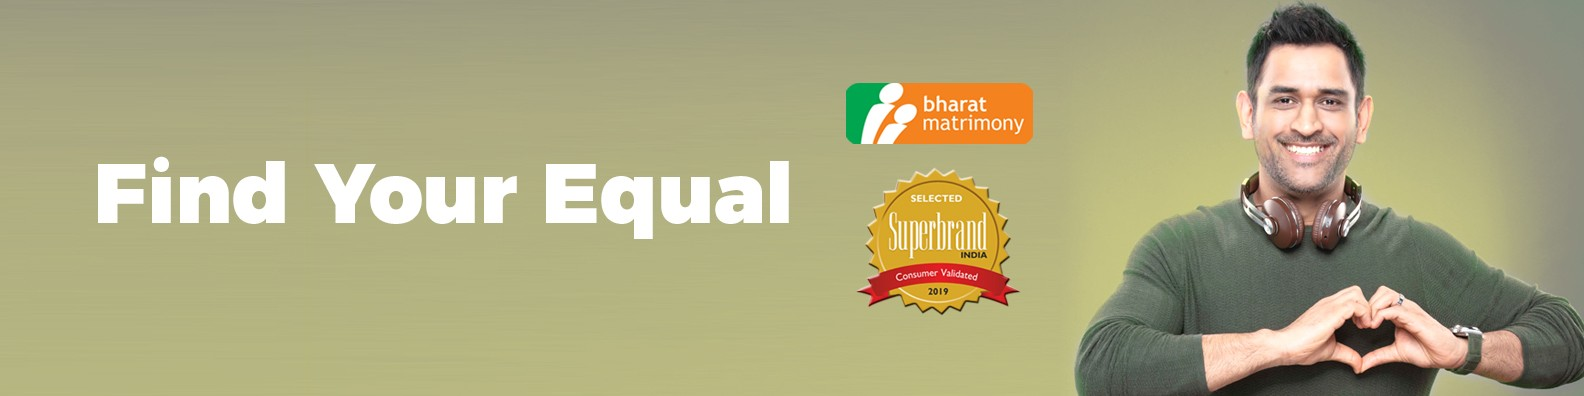 BharatMatrimony com | LinkedIn